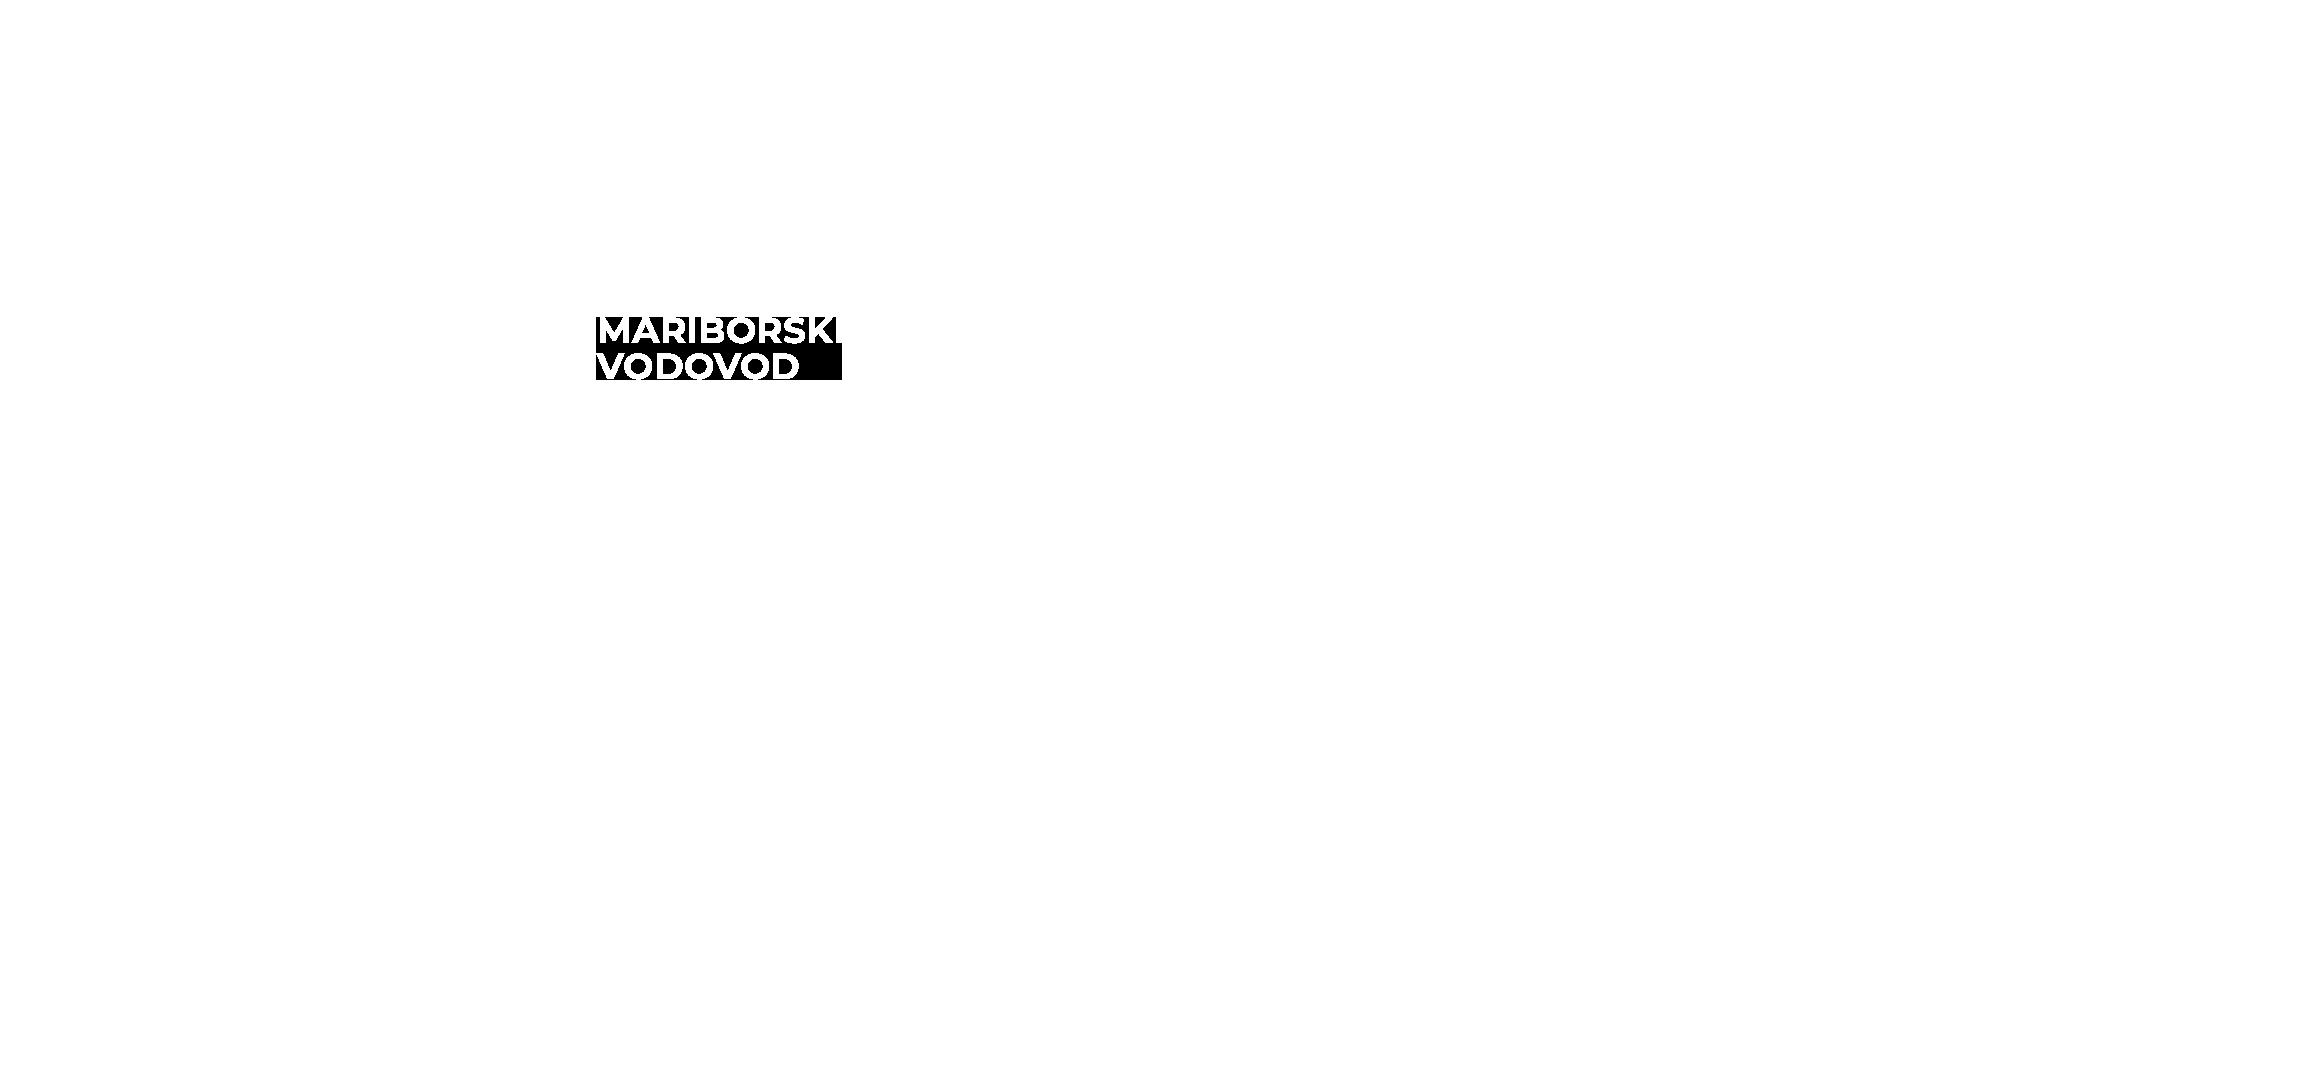 02 mv